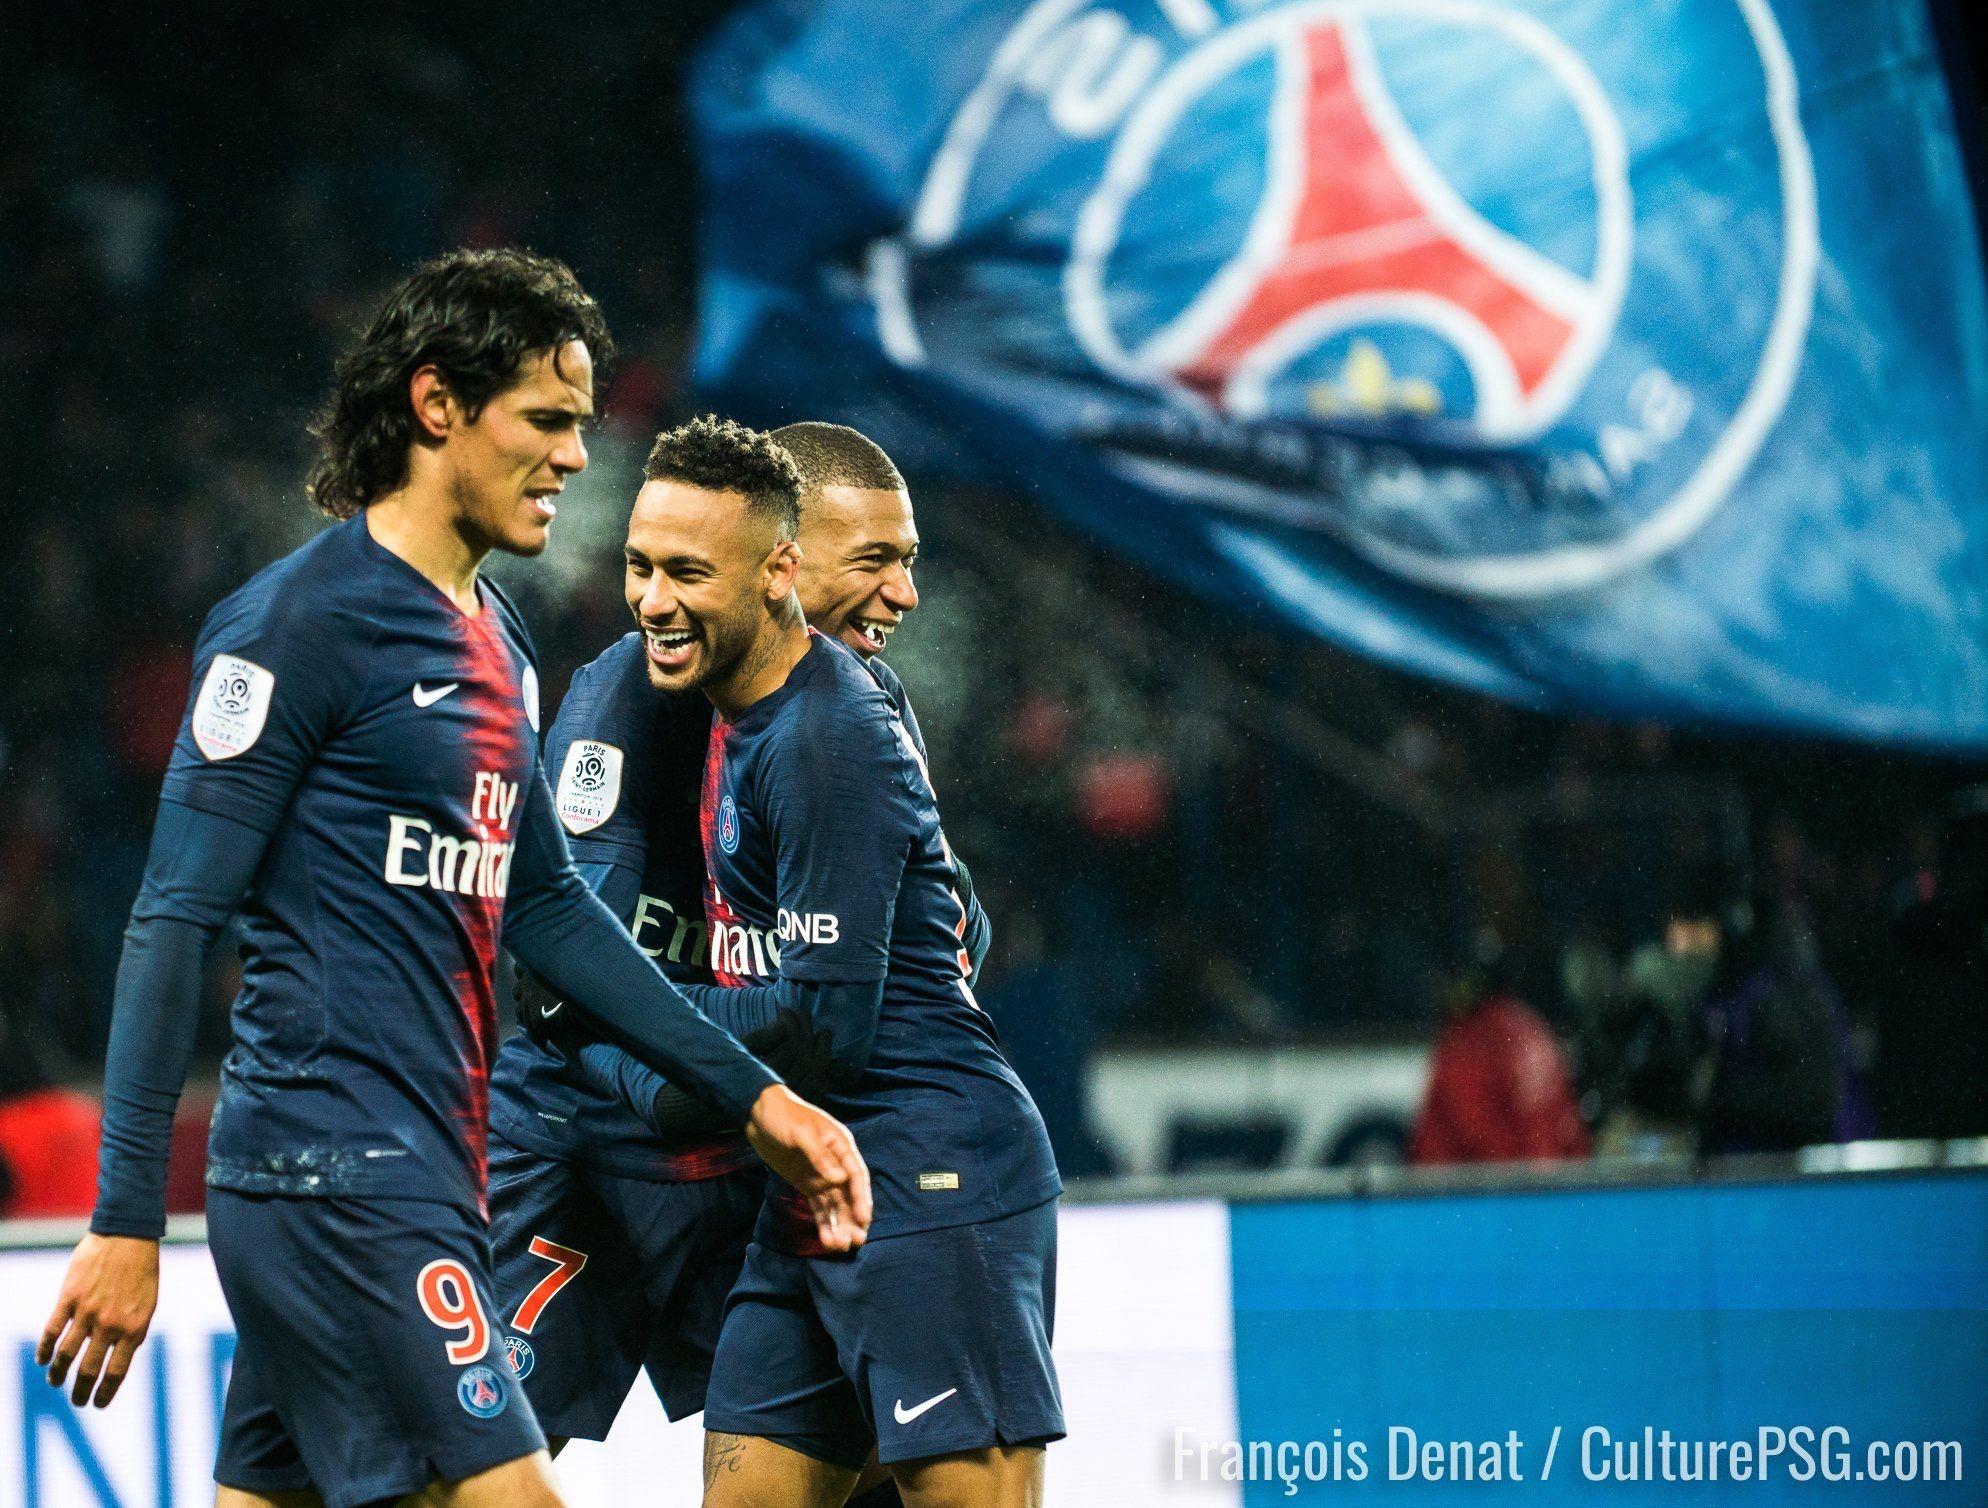 Pin By Wiliette Vakiaku On Paris Saint Germain Paris Saint Germain Neymar Jr Paris Saint